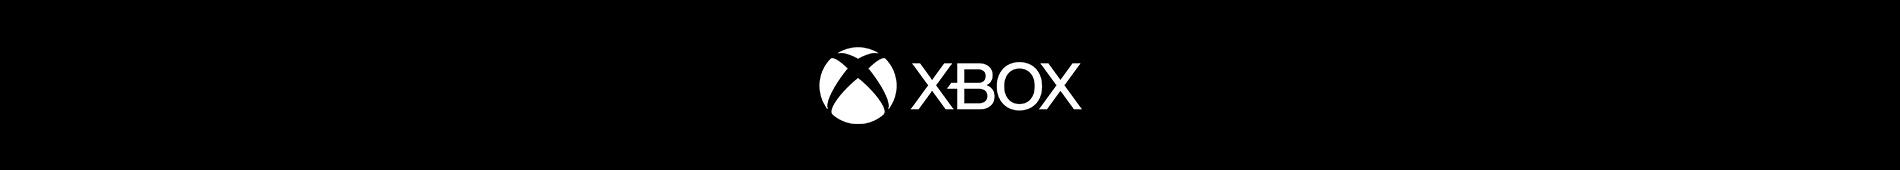 Microsoft Xbox One General Nav Buttons  Btm Banner Tile 15